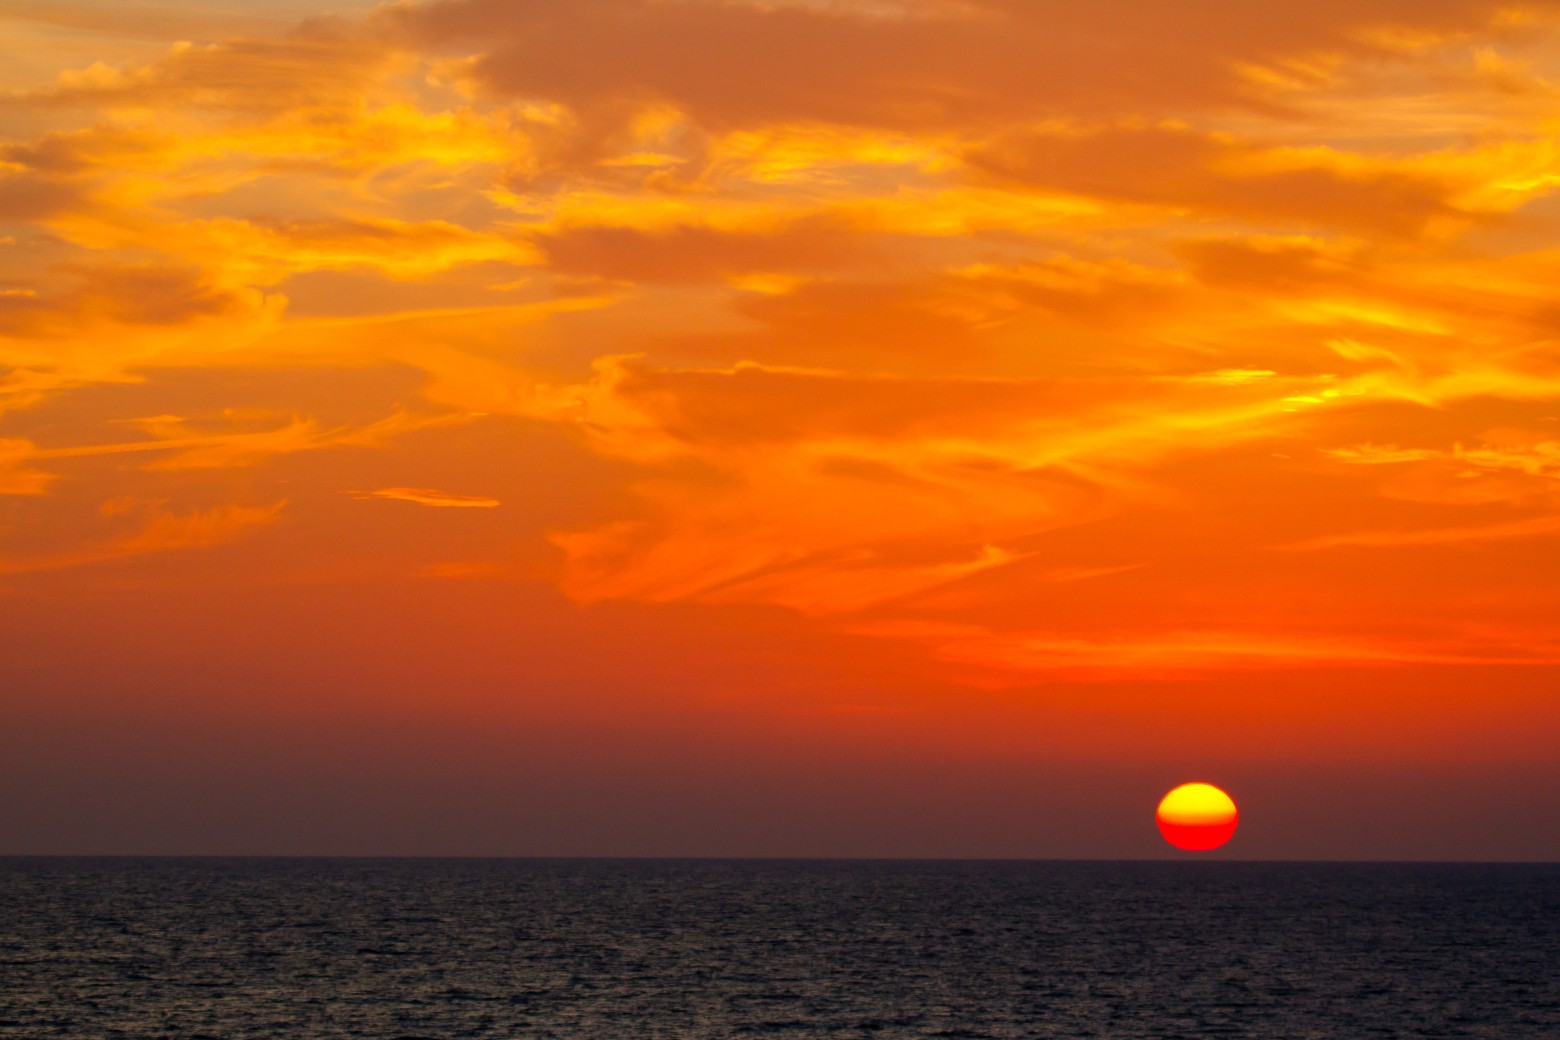 Beau coucher de soleil plage mer oc an sunset fond d for Images gratuites fond ecran mer